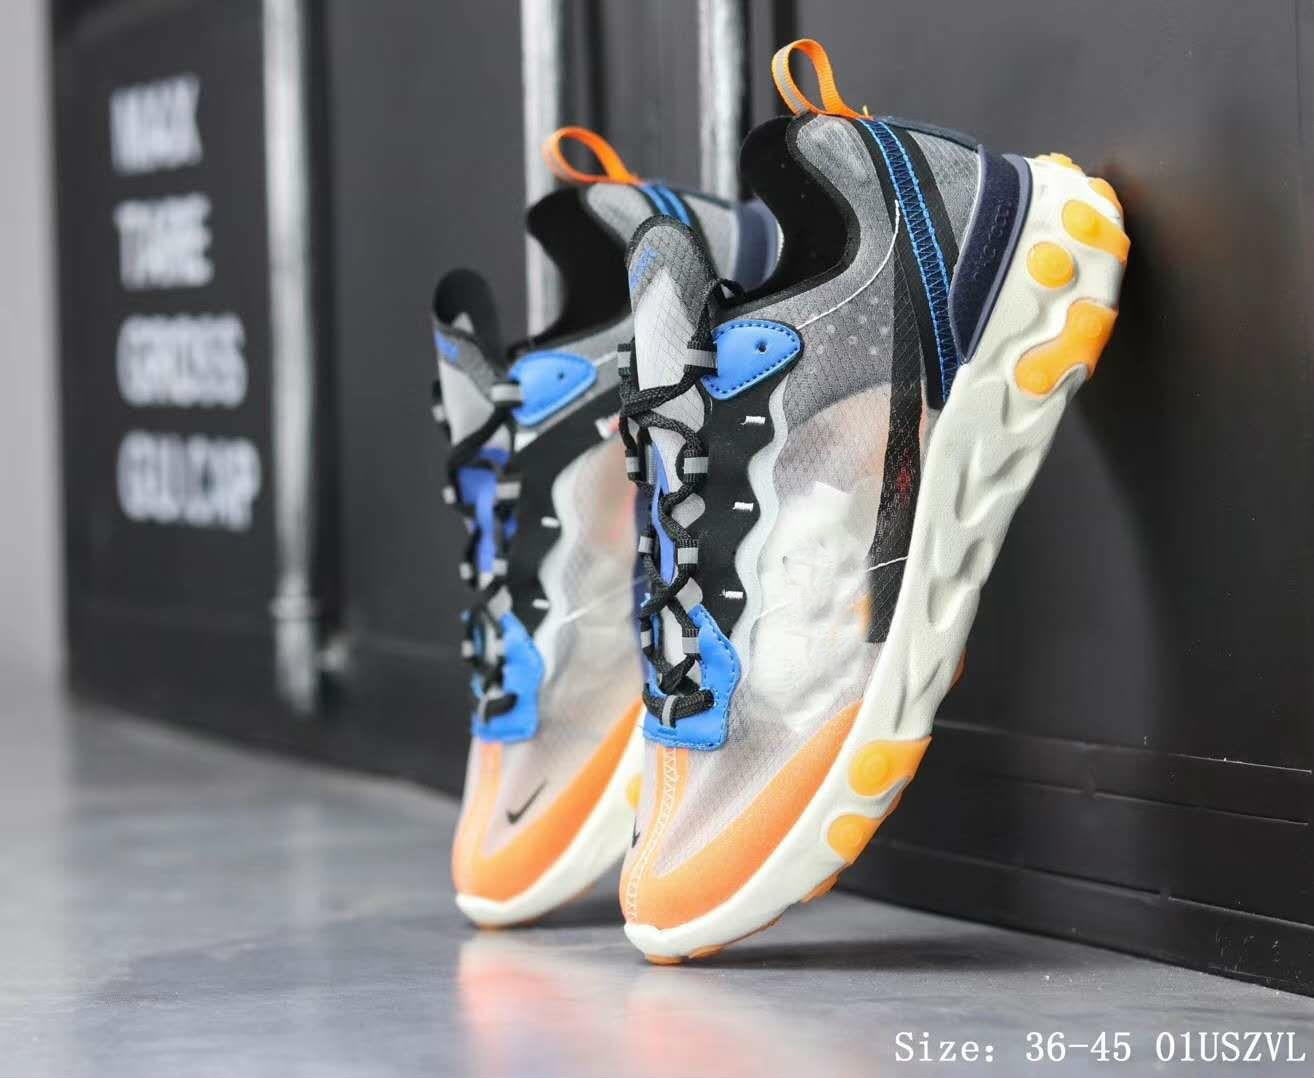 buy online 628c0 1023b Air 270 Mens Shoes Sneakers Men Vapormax Tn Plus 2 Max Shoes Women Running  Trainers